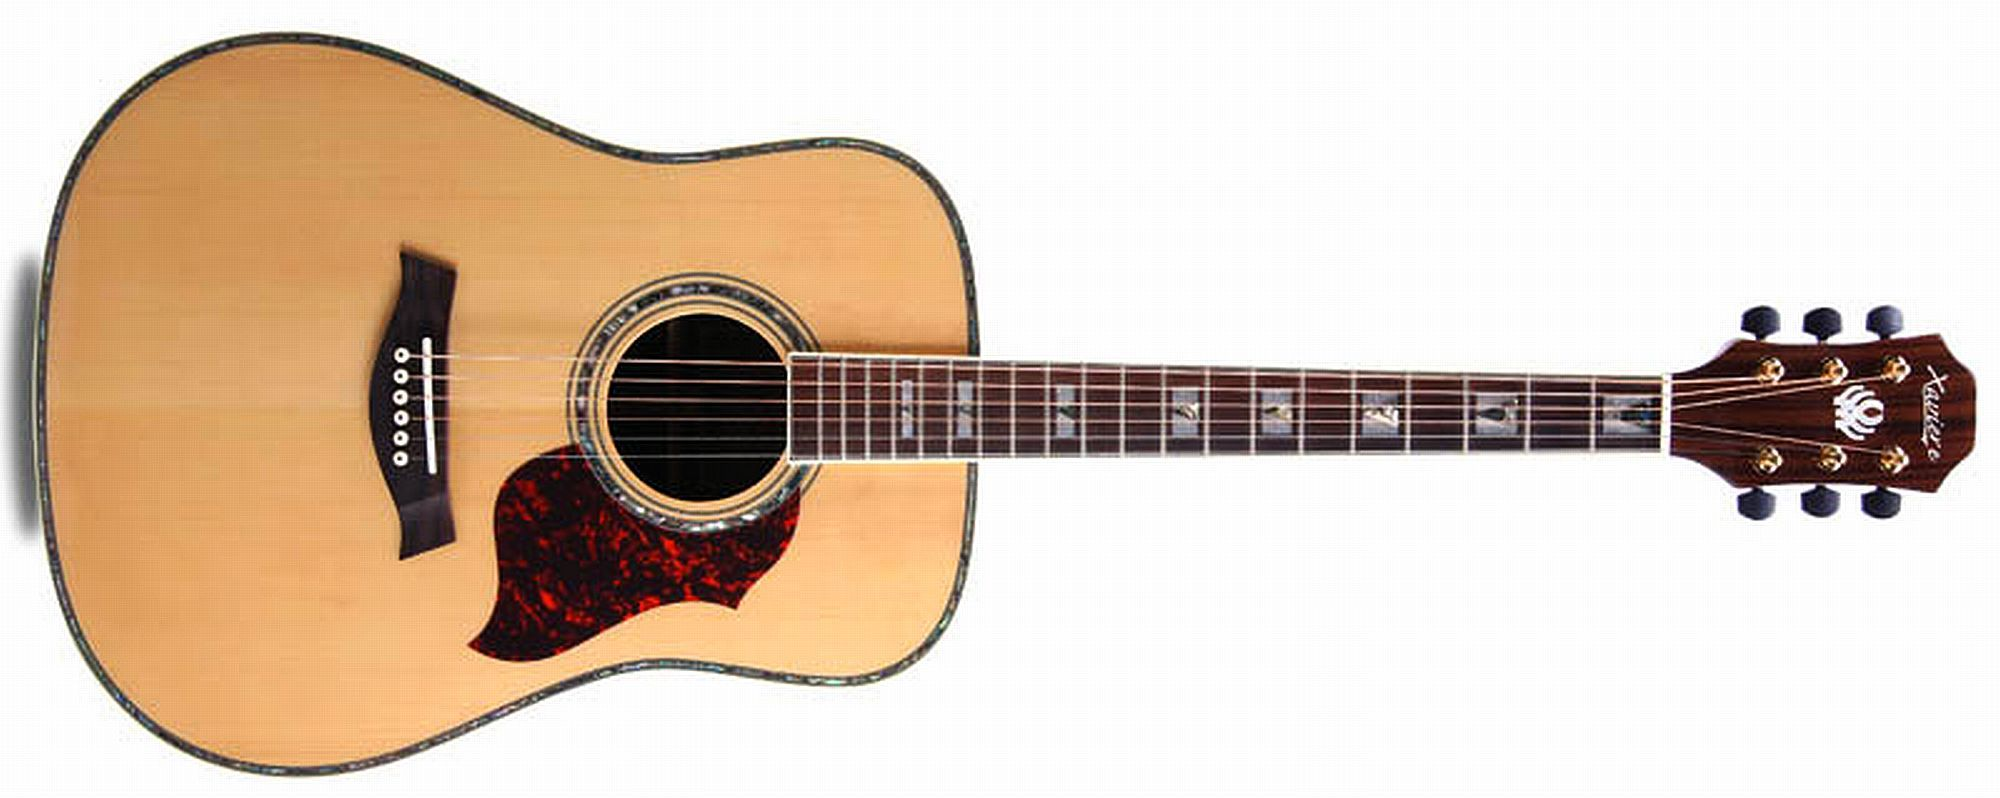 New Ax Guild Guitars Guitar Acoustic